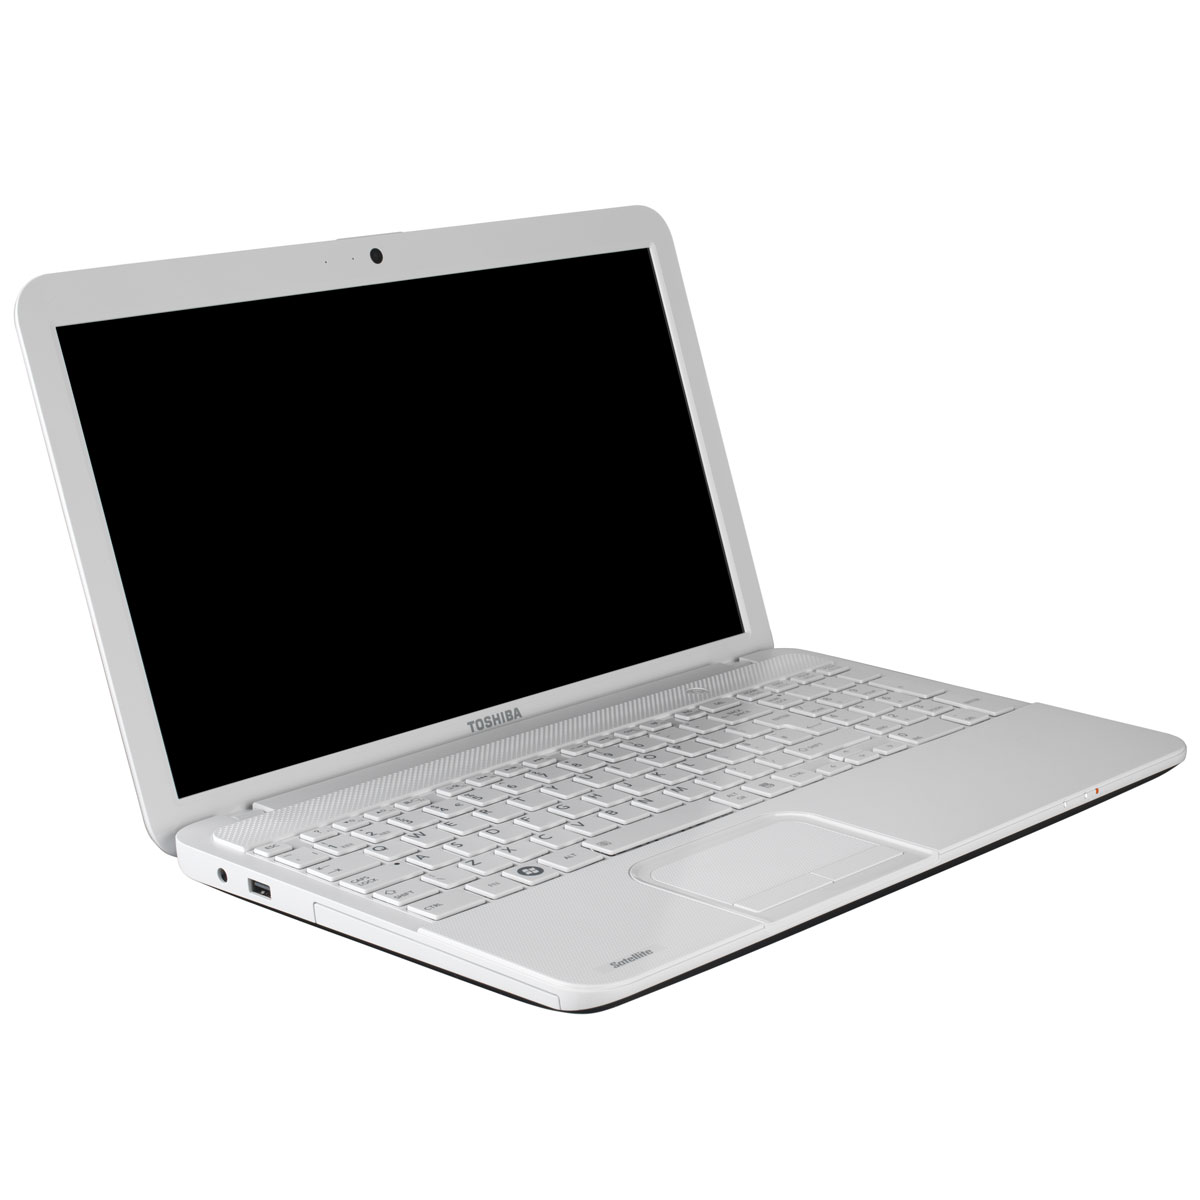 how to turn bluetooth on windows 8 toshiba laptop